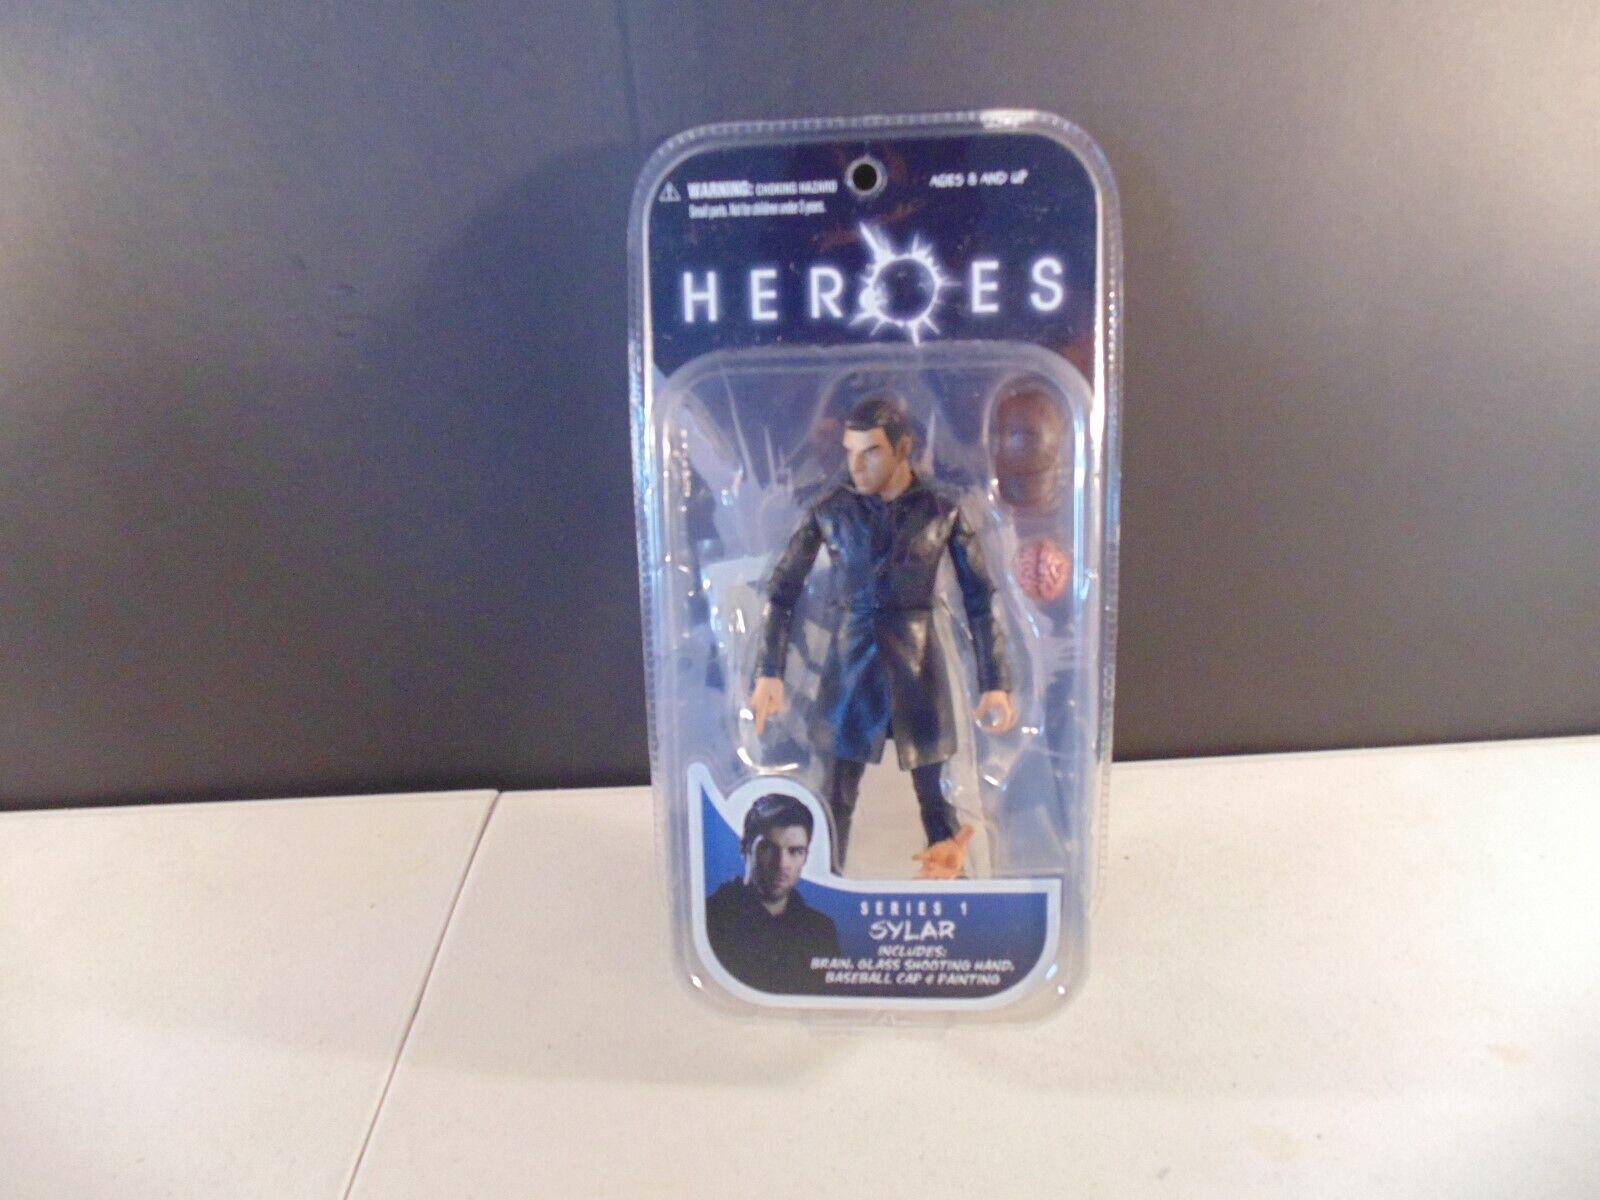 Heroes Series 1 1 1 Sylar Action Figure Mezco 51c857